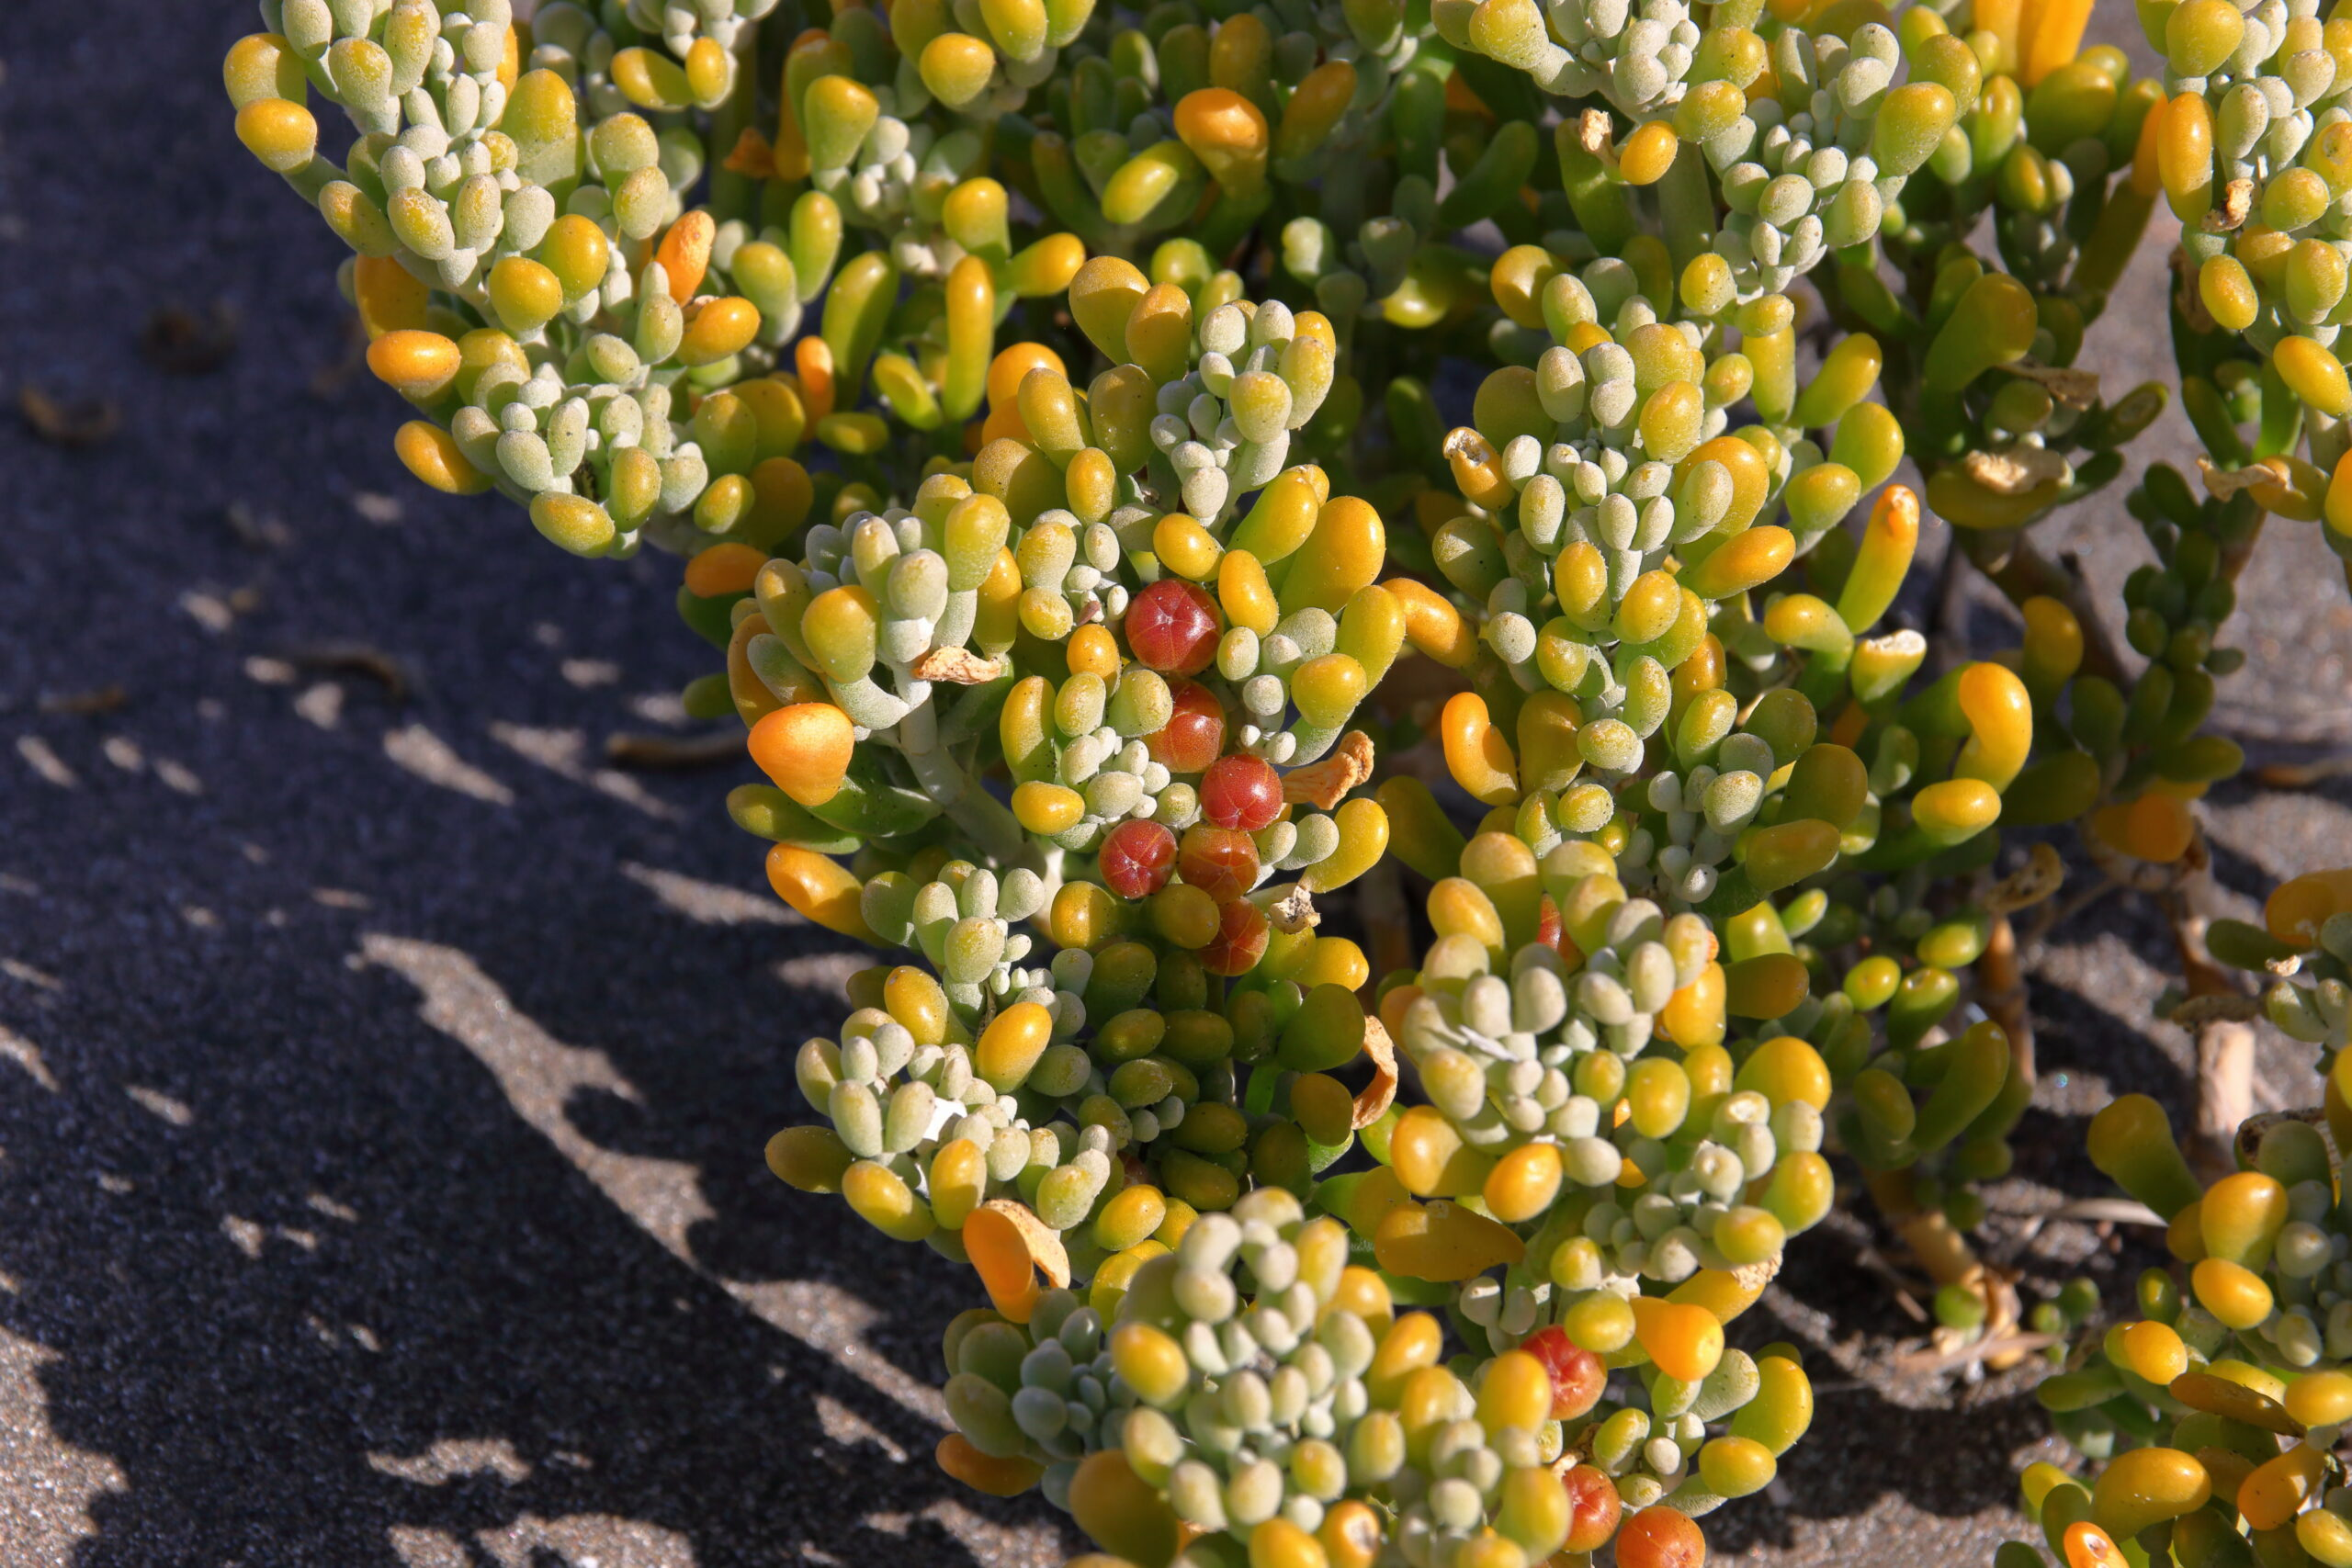 img_7047-hojas-uva-de-mar-comun-salado-moro-babosa-tetraena-fontanesii--scaled.jpg